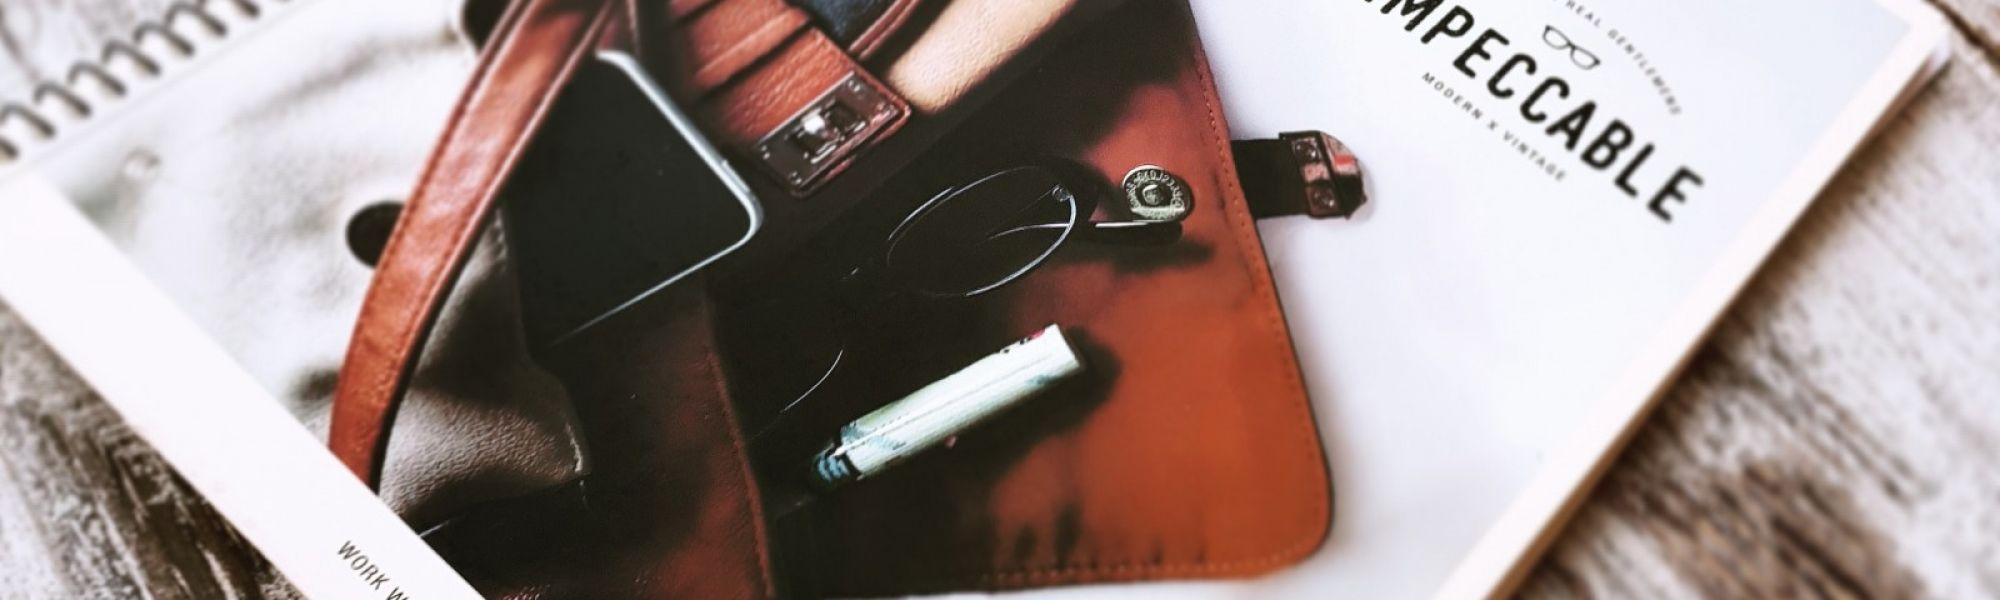 Spiral bound book with